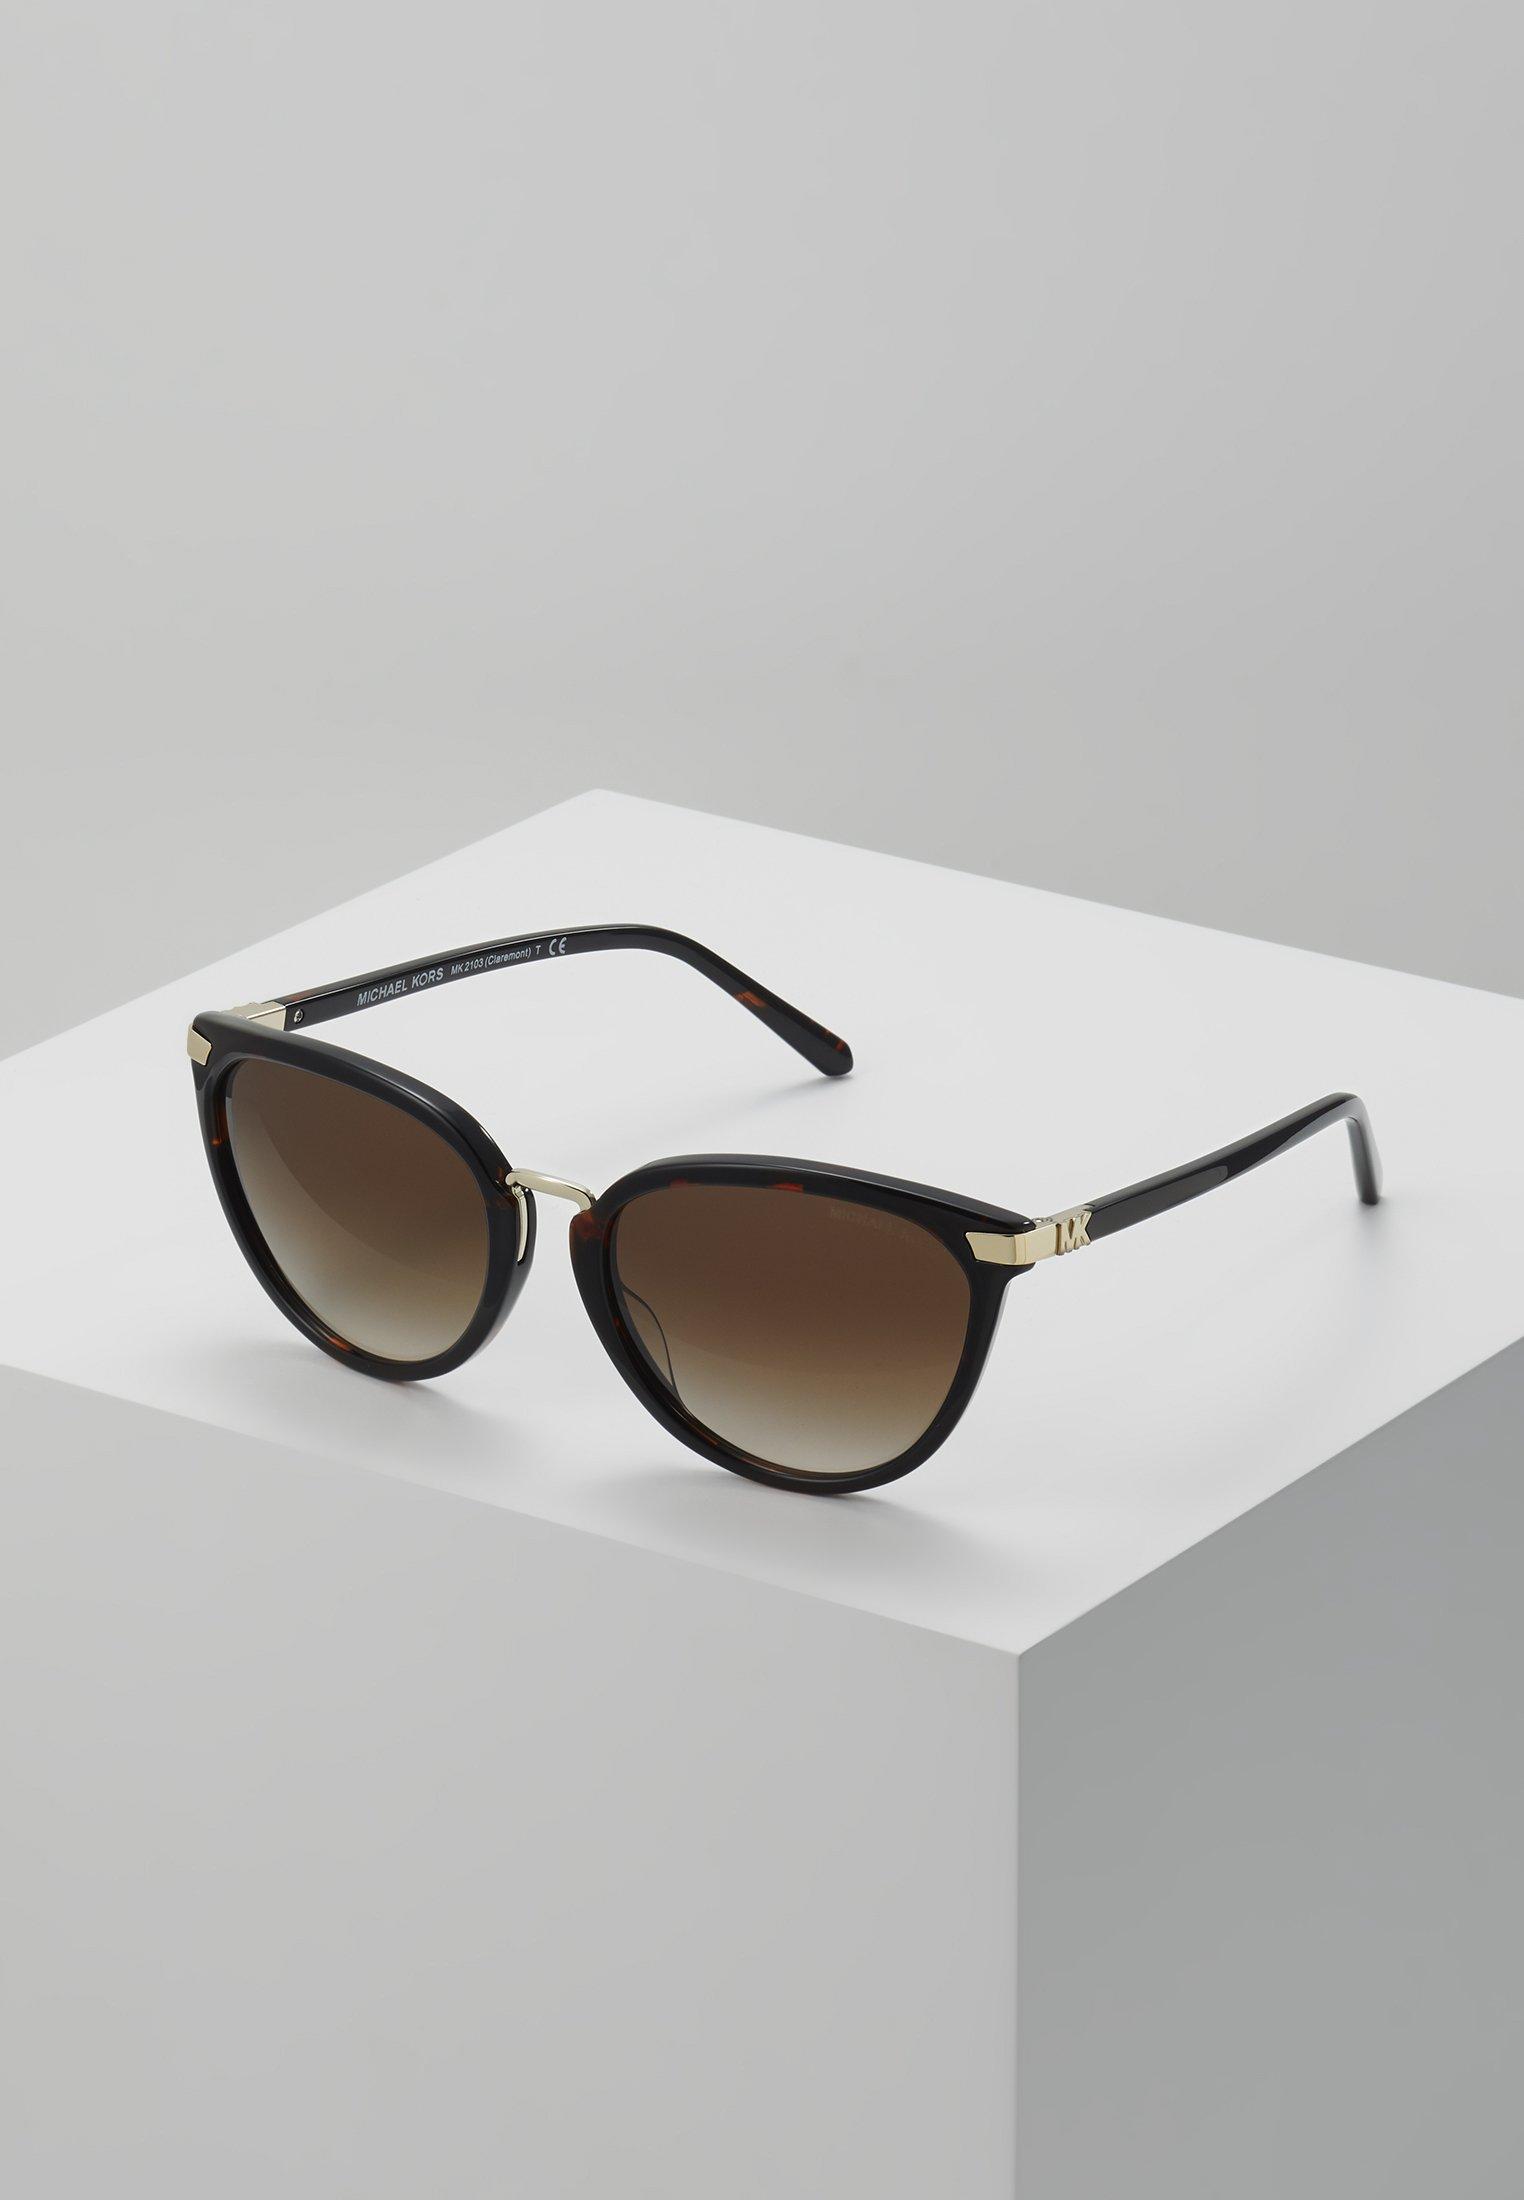 Michael Kors Sunglasses - tort